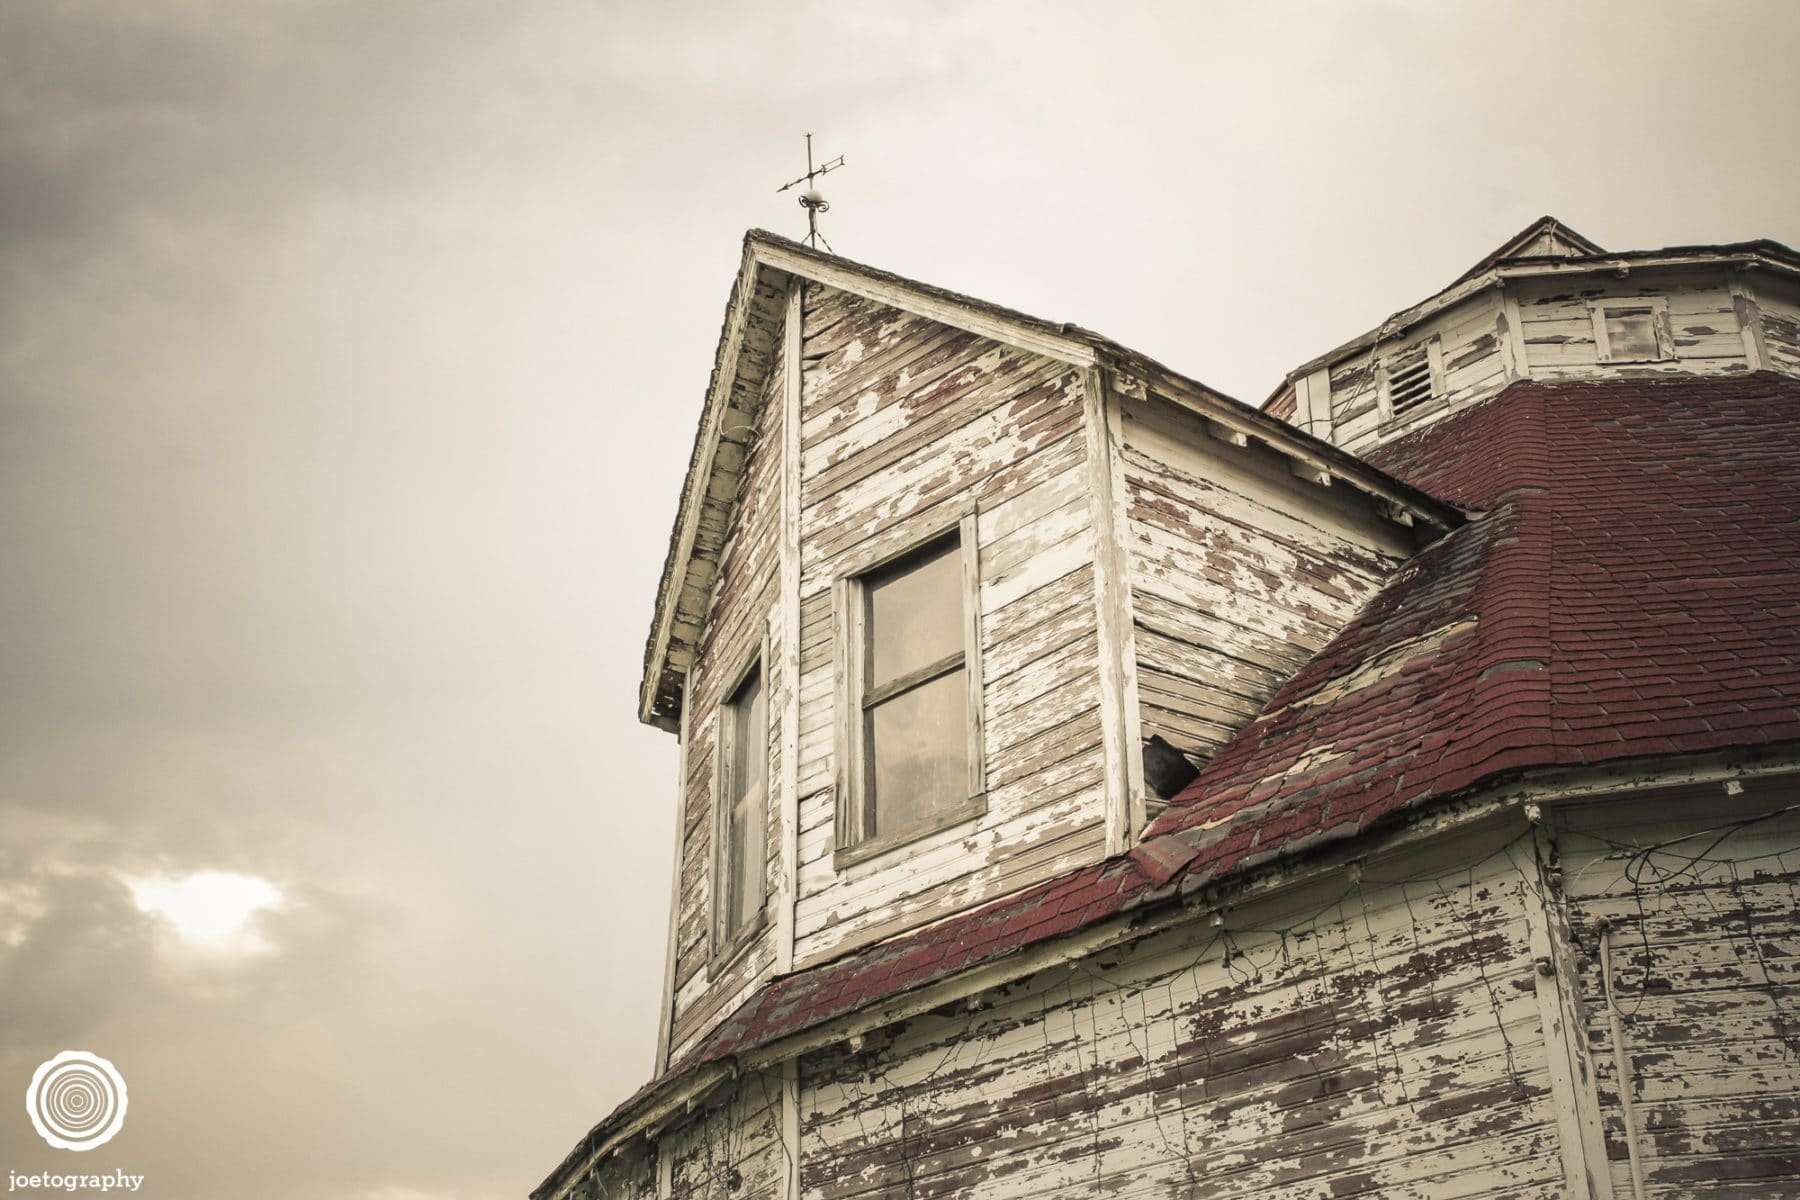 polygonal-barn-architecture-photos-shelbyville-indiana-1